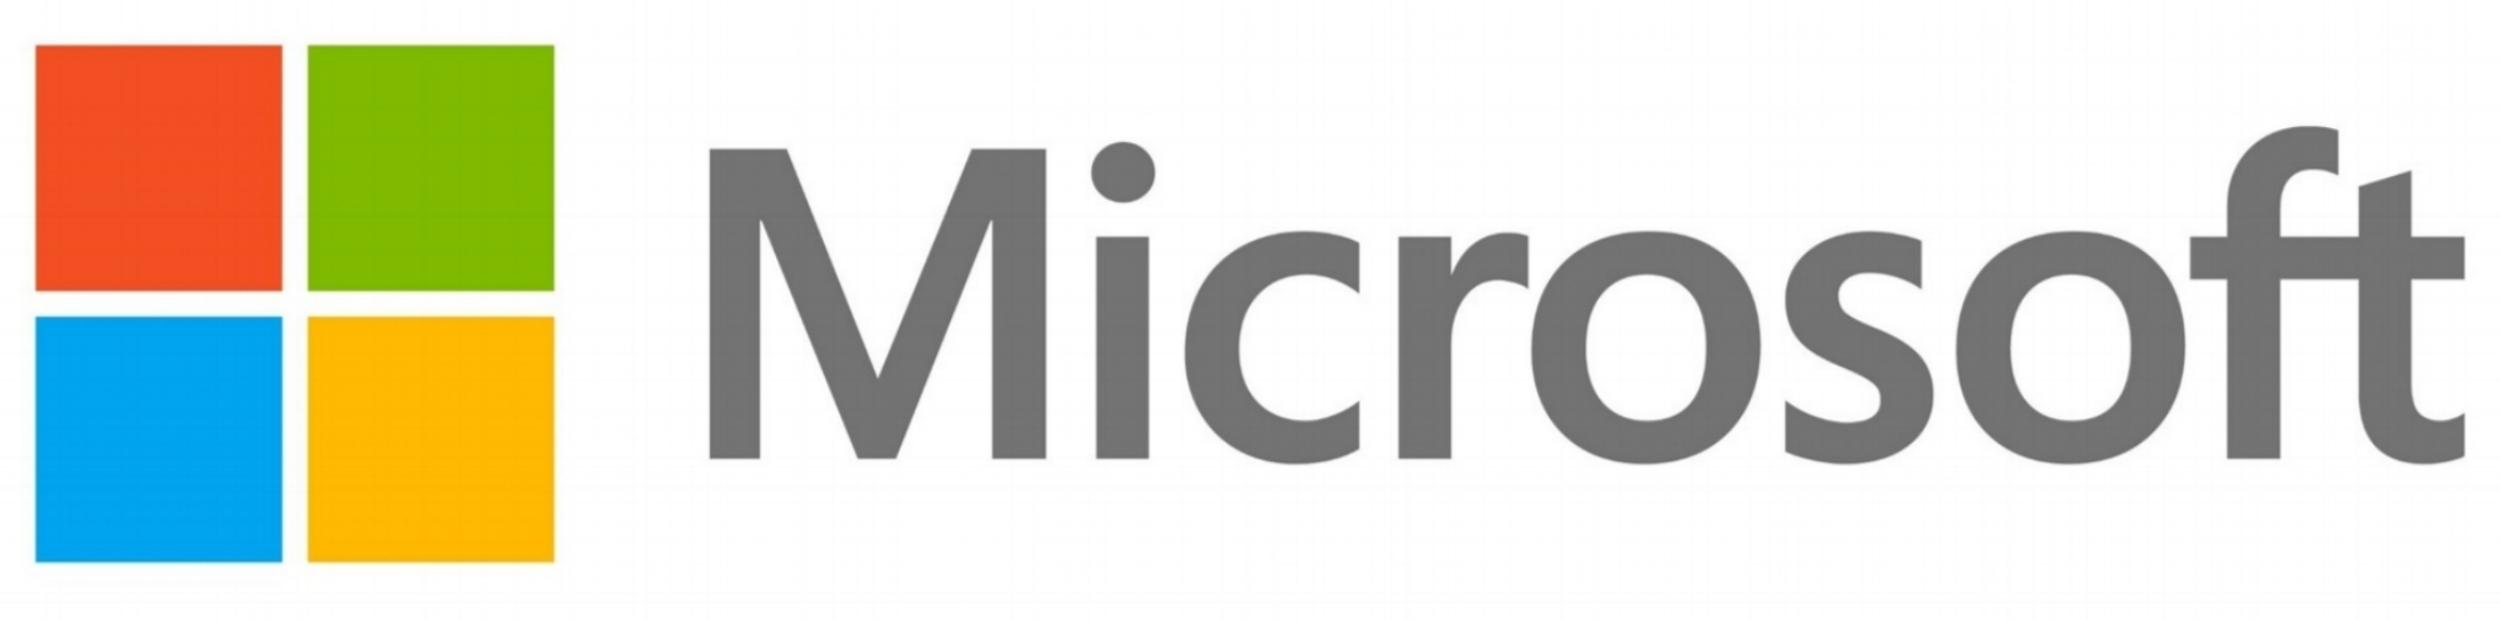 Microsoft_5F00_Logo.jpg